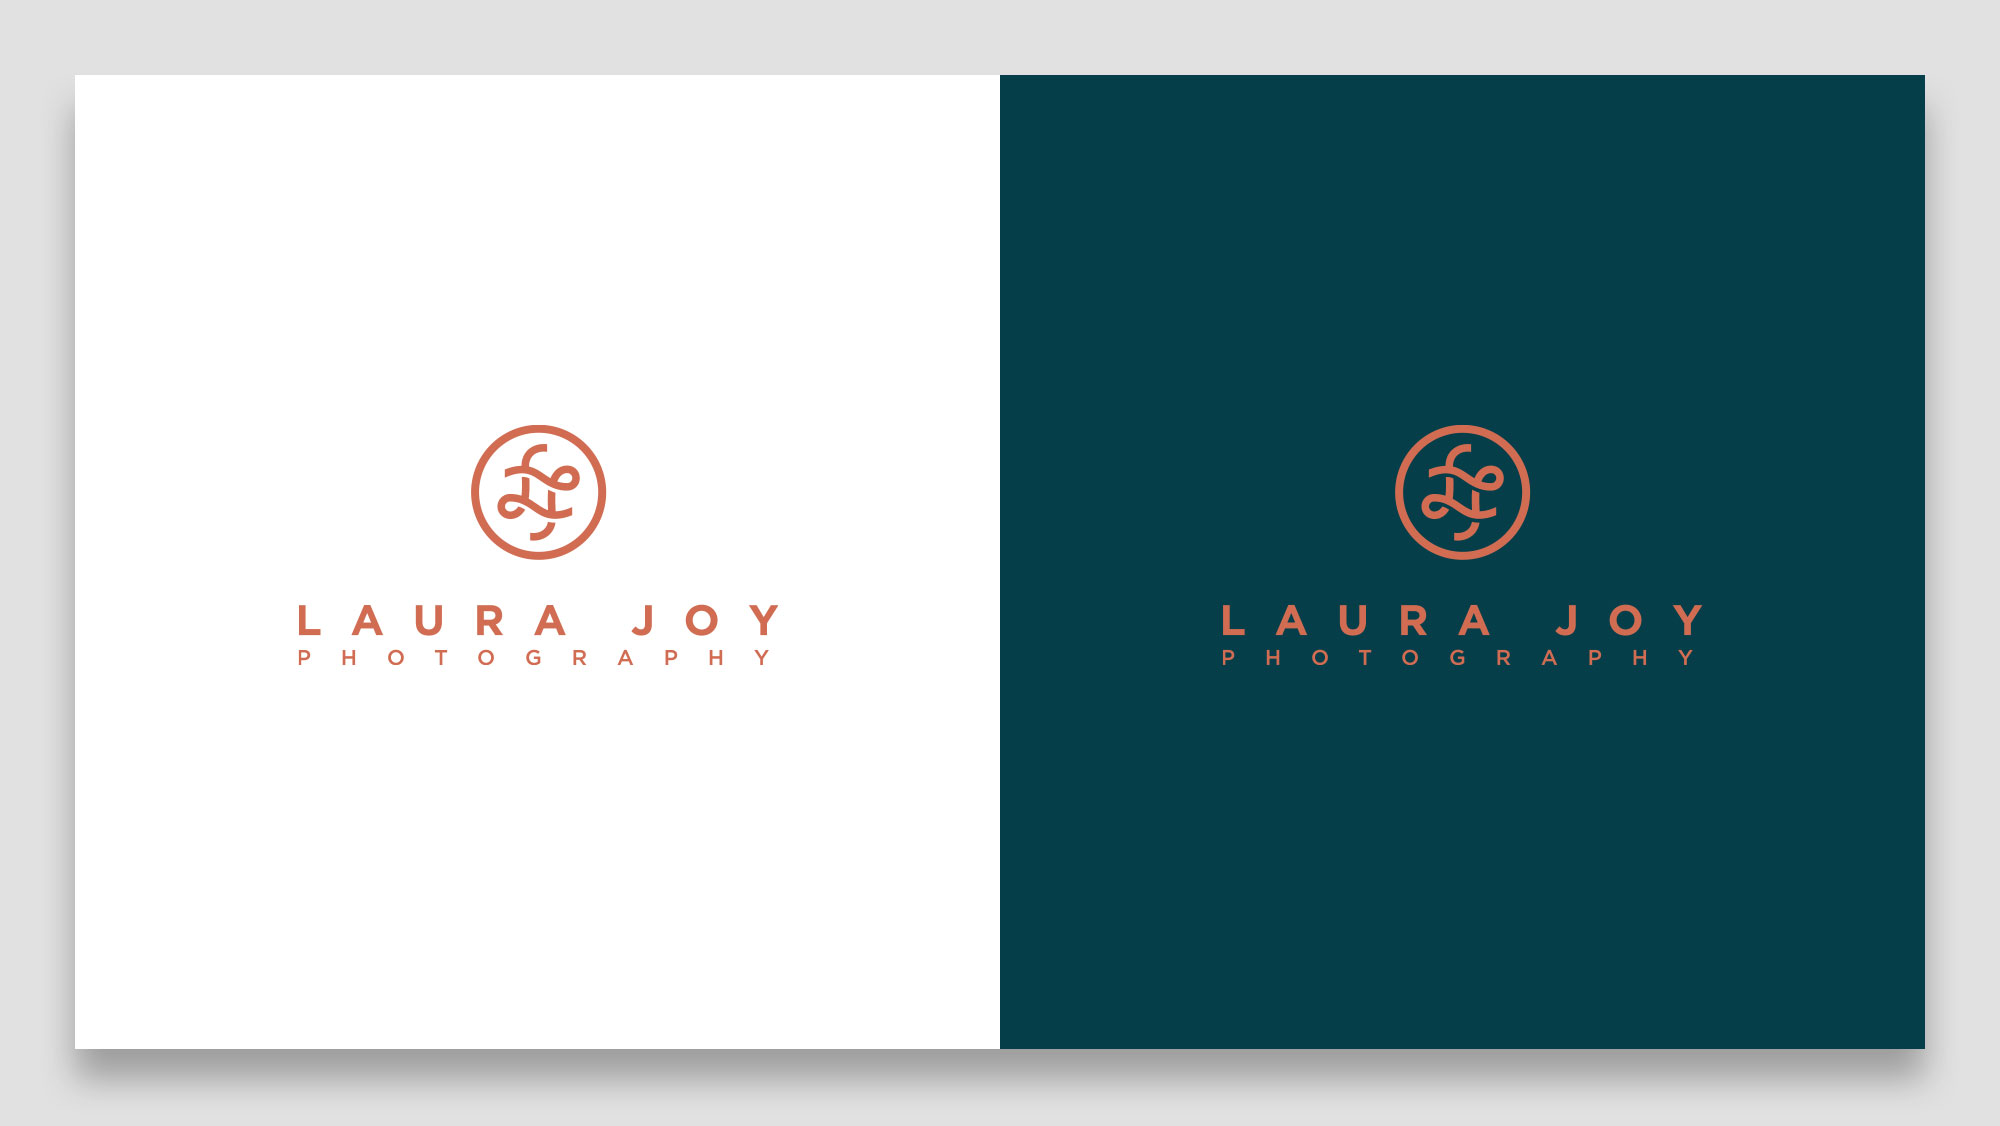 Laura Joy Photography Logo on Brand Colours